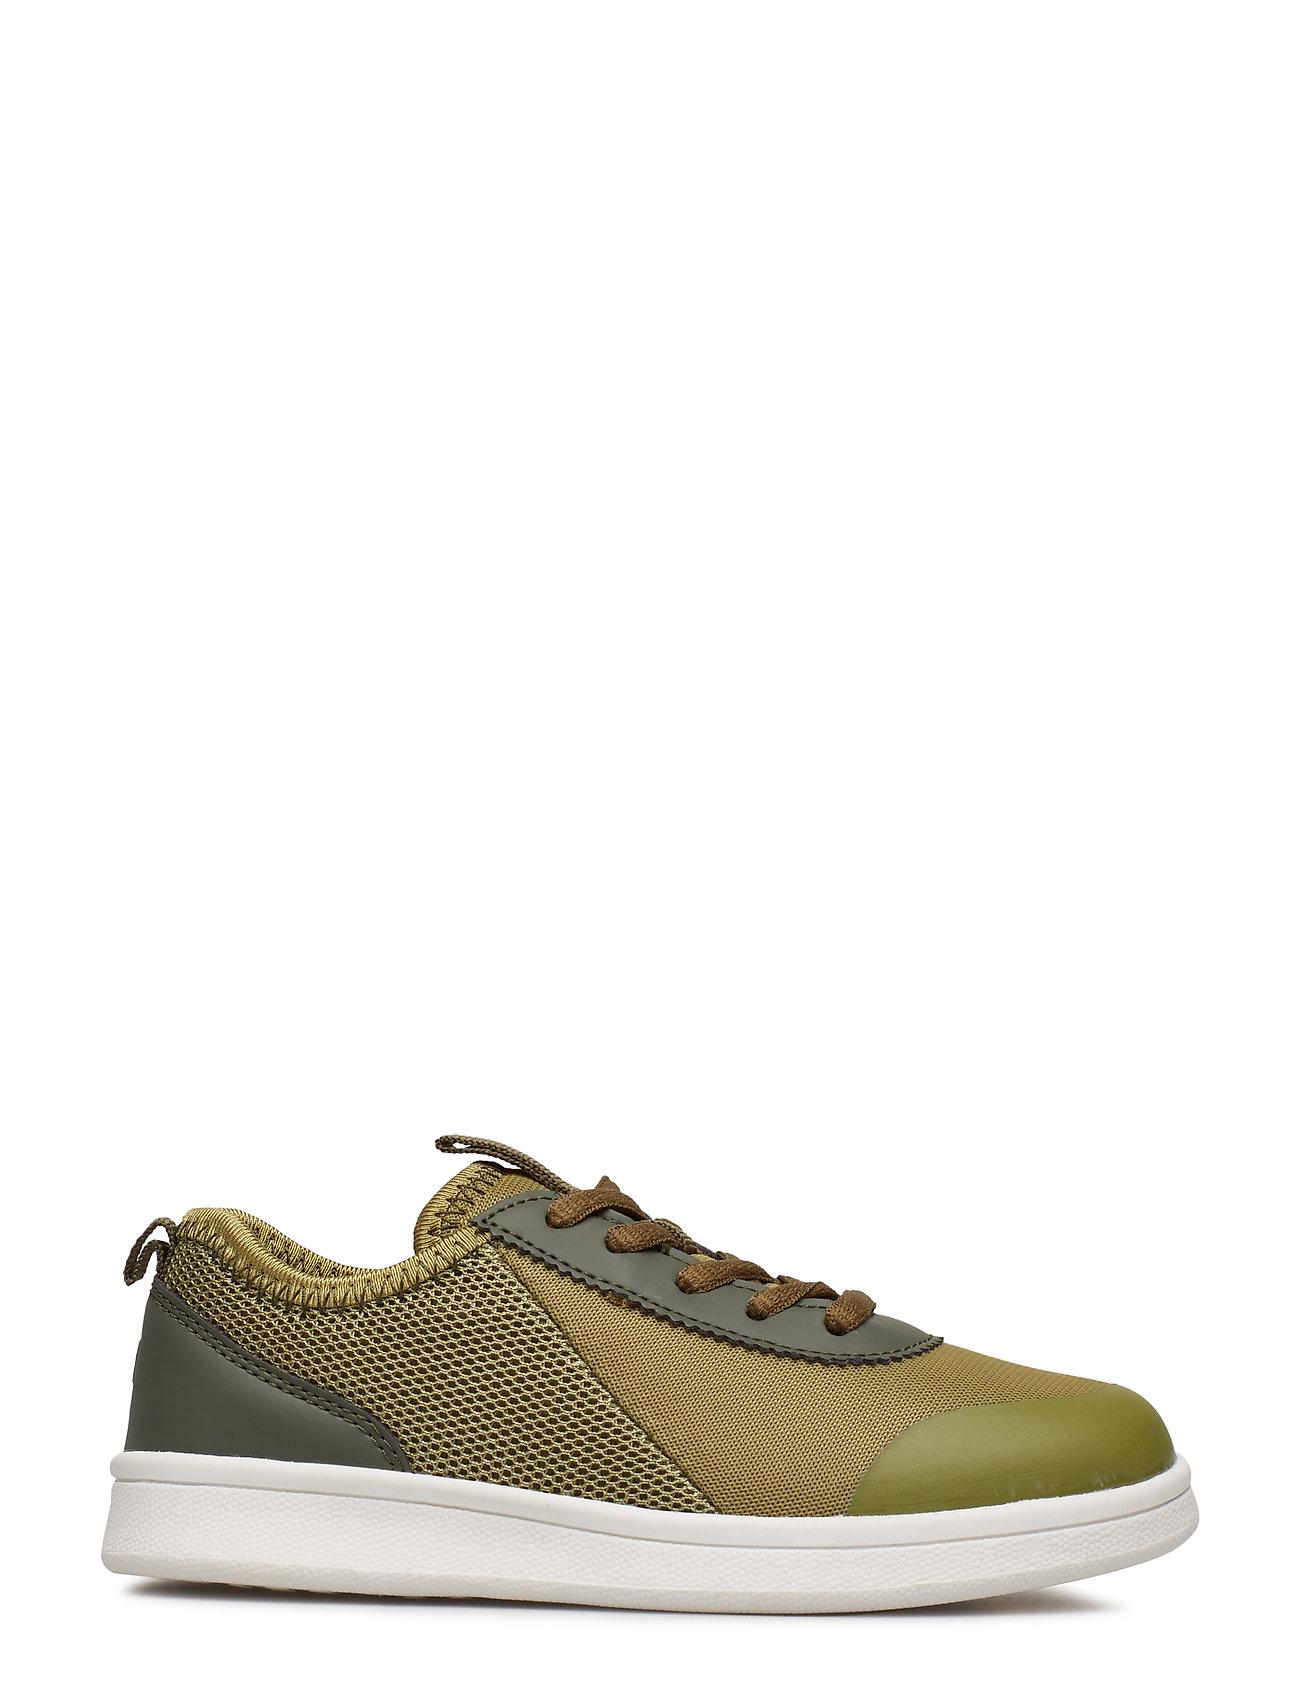 Grøn, Sko Danmarks største udvalg af sko | FOOTWAY.dk